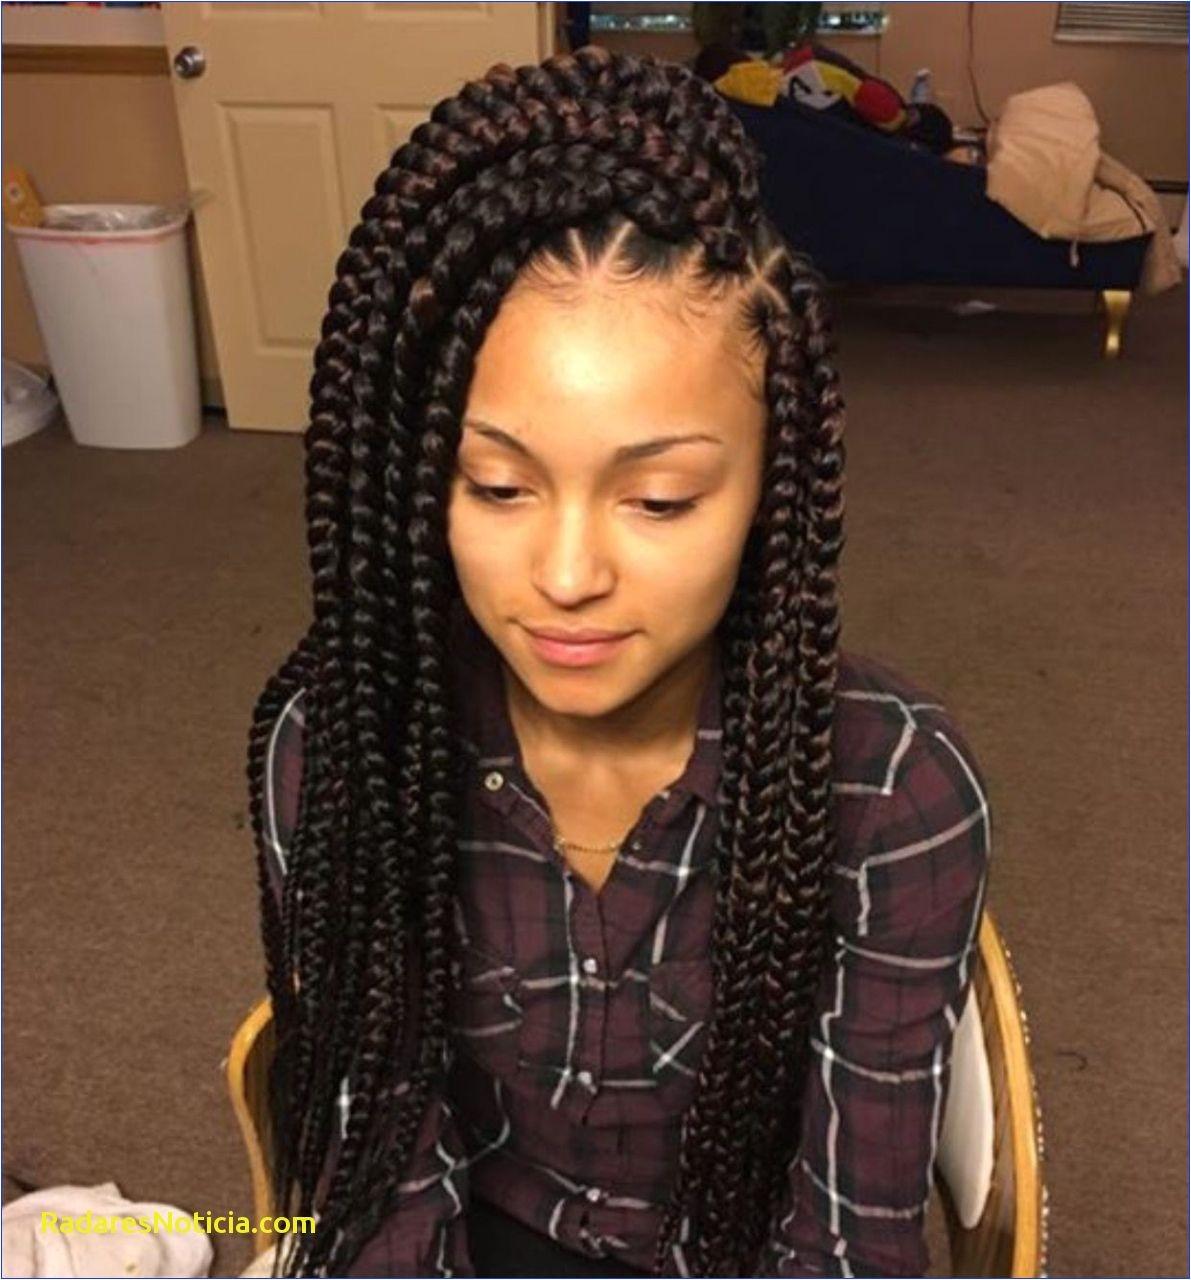 Braids Styles Pixelweekly Lil Girl Twist Hairstyles Unique Little Girl Braided Hairstyles